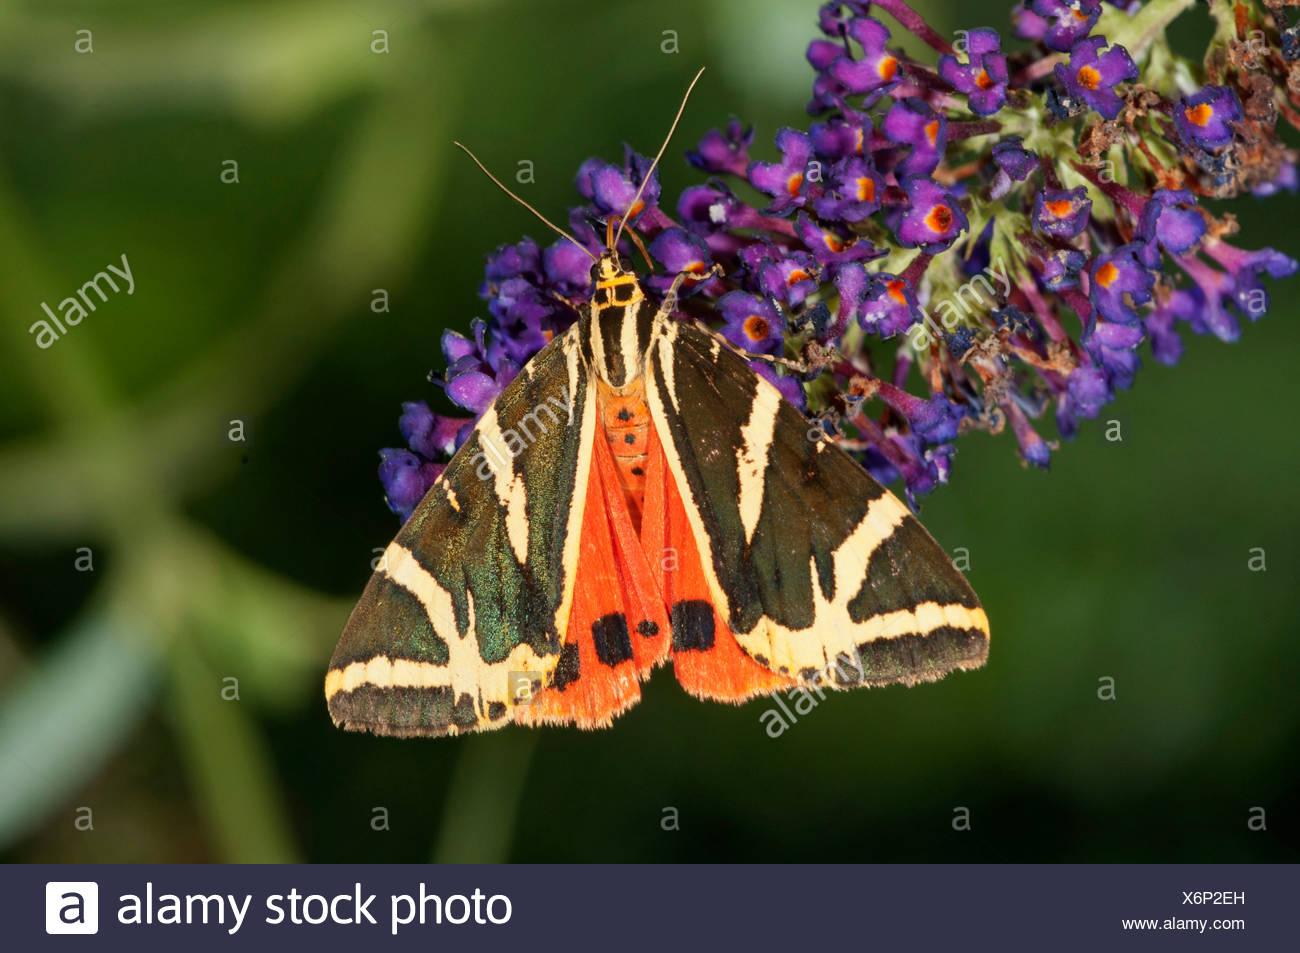 Jersey Tiger (Euplagia quadripunctaria) sucking nectar from Buddleja, butterfly bush - Stock Image